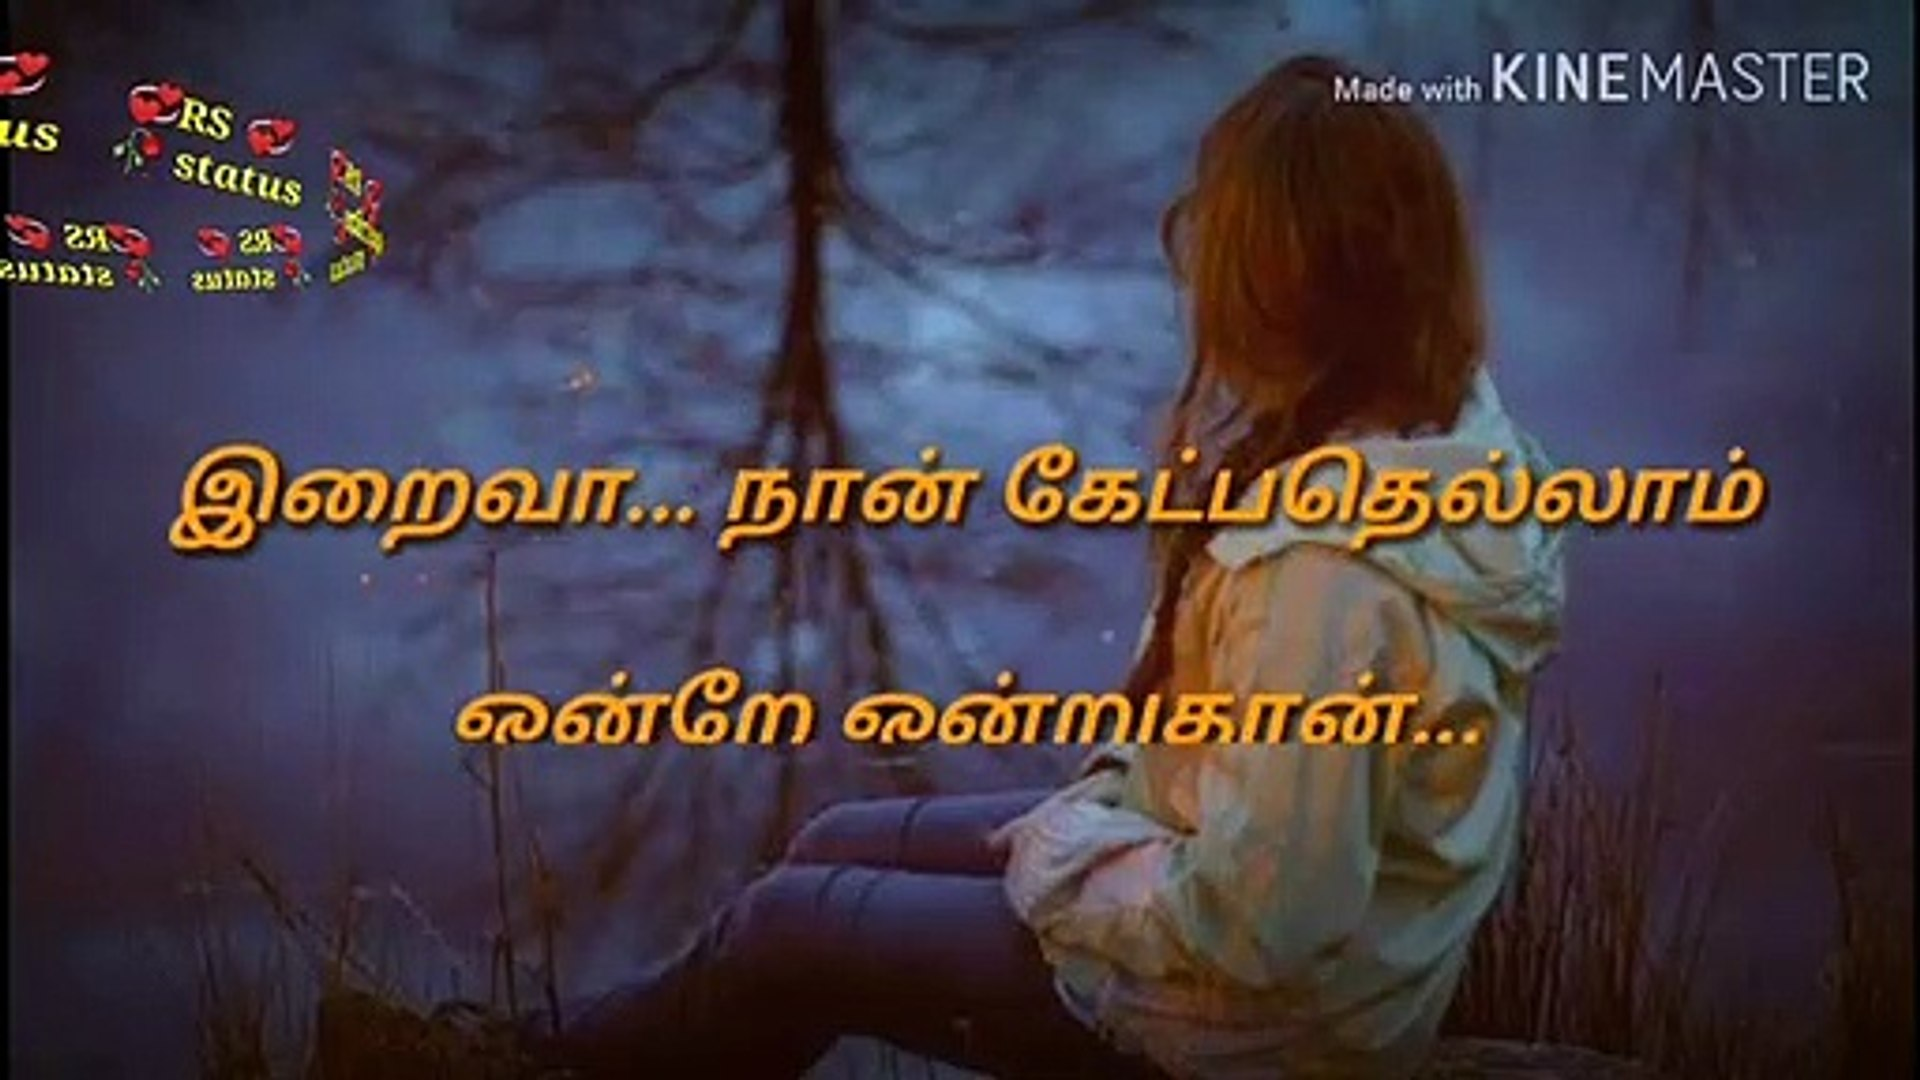 WhatsApp status video RS status Tamil vodios songs status video New status video Tamil Nadu